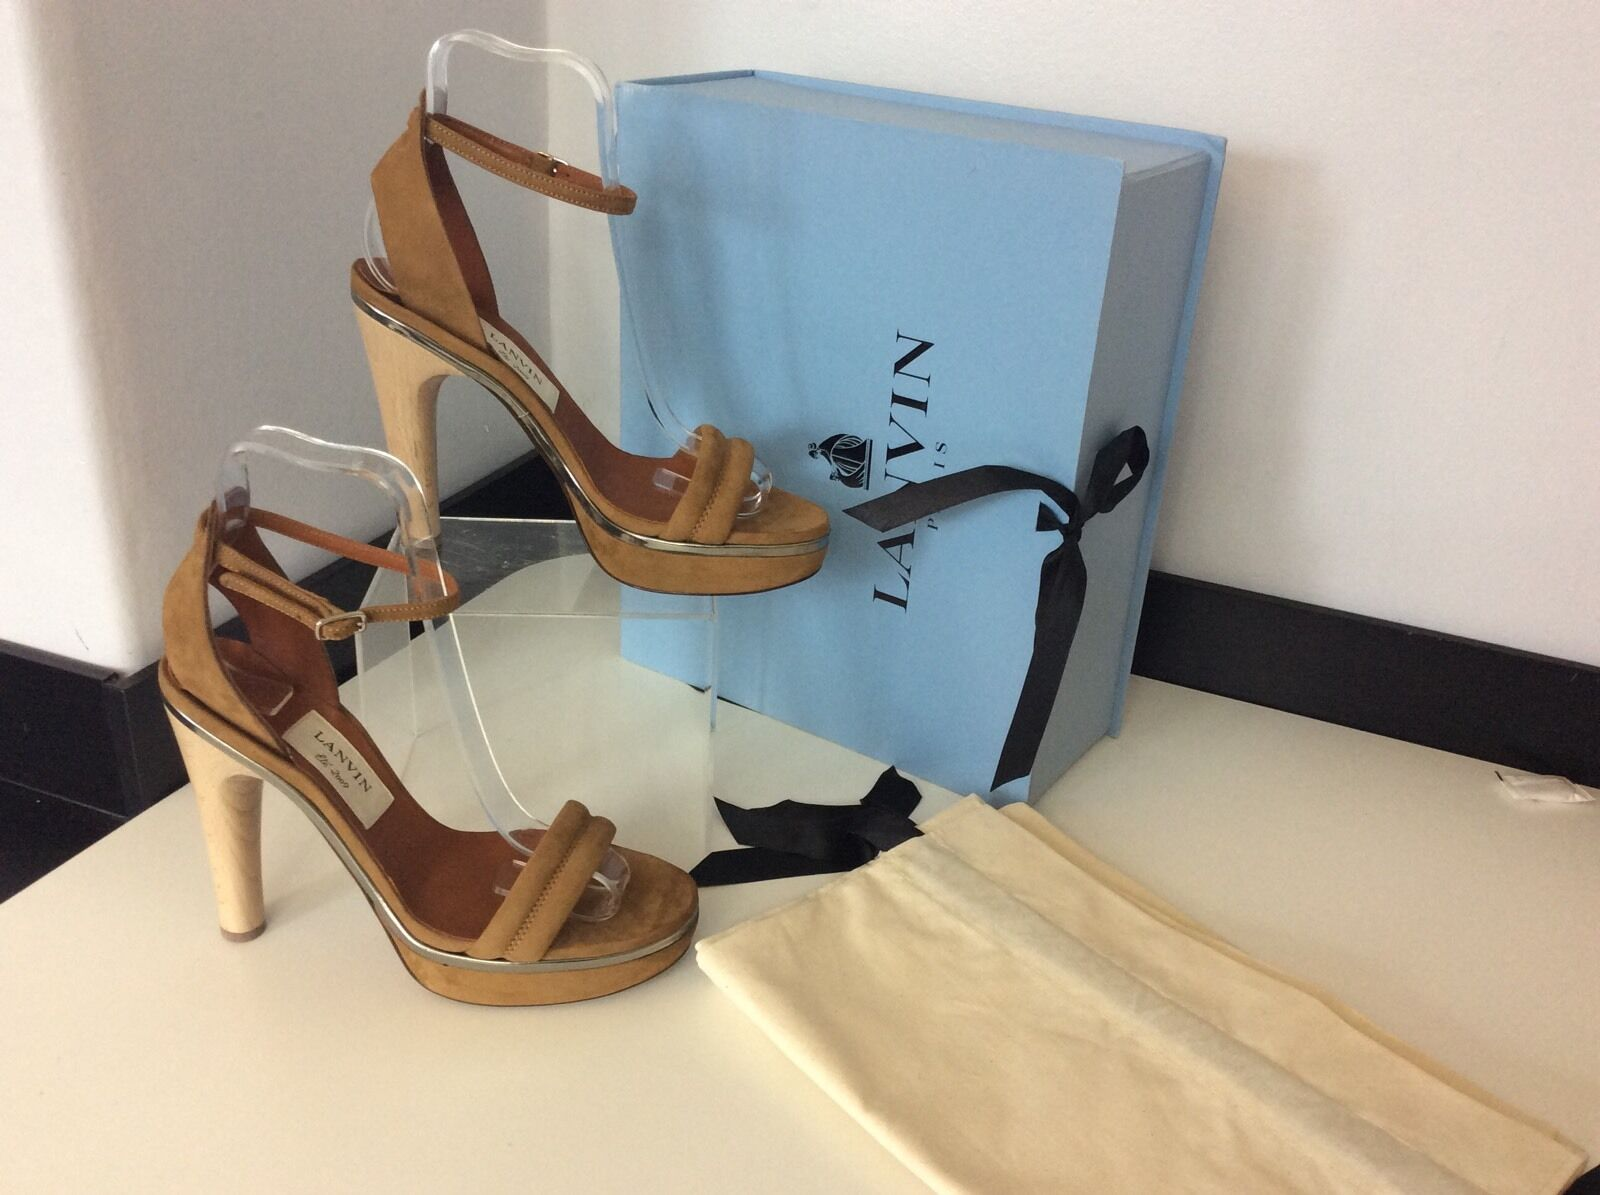 LANVIN NEW Tan Sandal schuhe Heel Größe 37.5 Uk 4.5  Peep Toe BNWB Box Dustbag    Kompletter Spezifikationsbereich